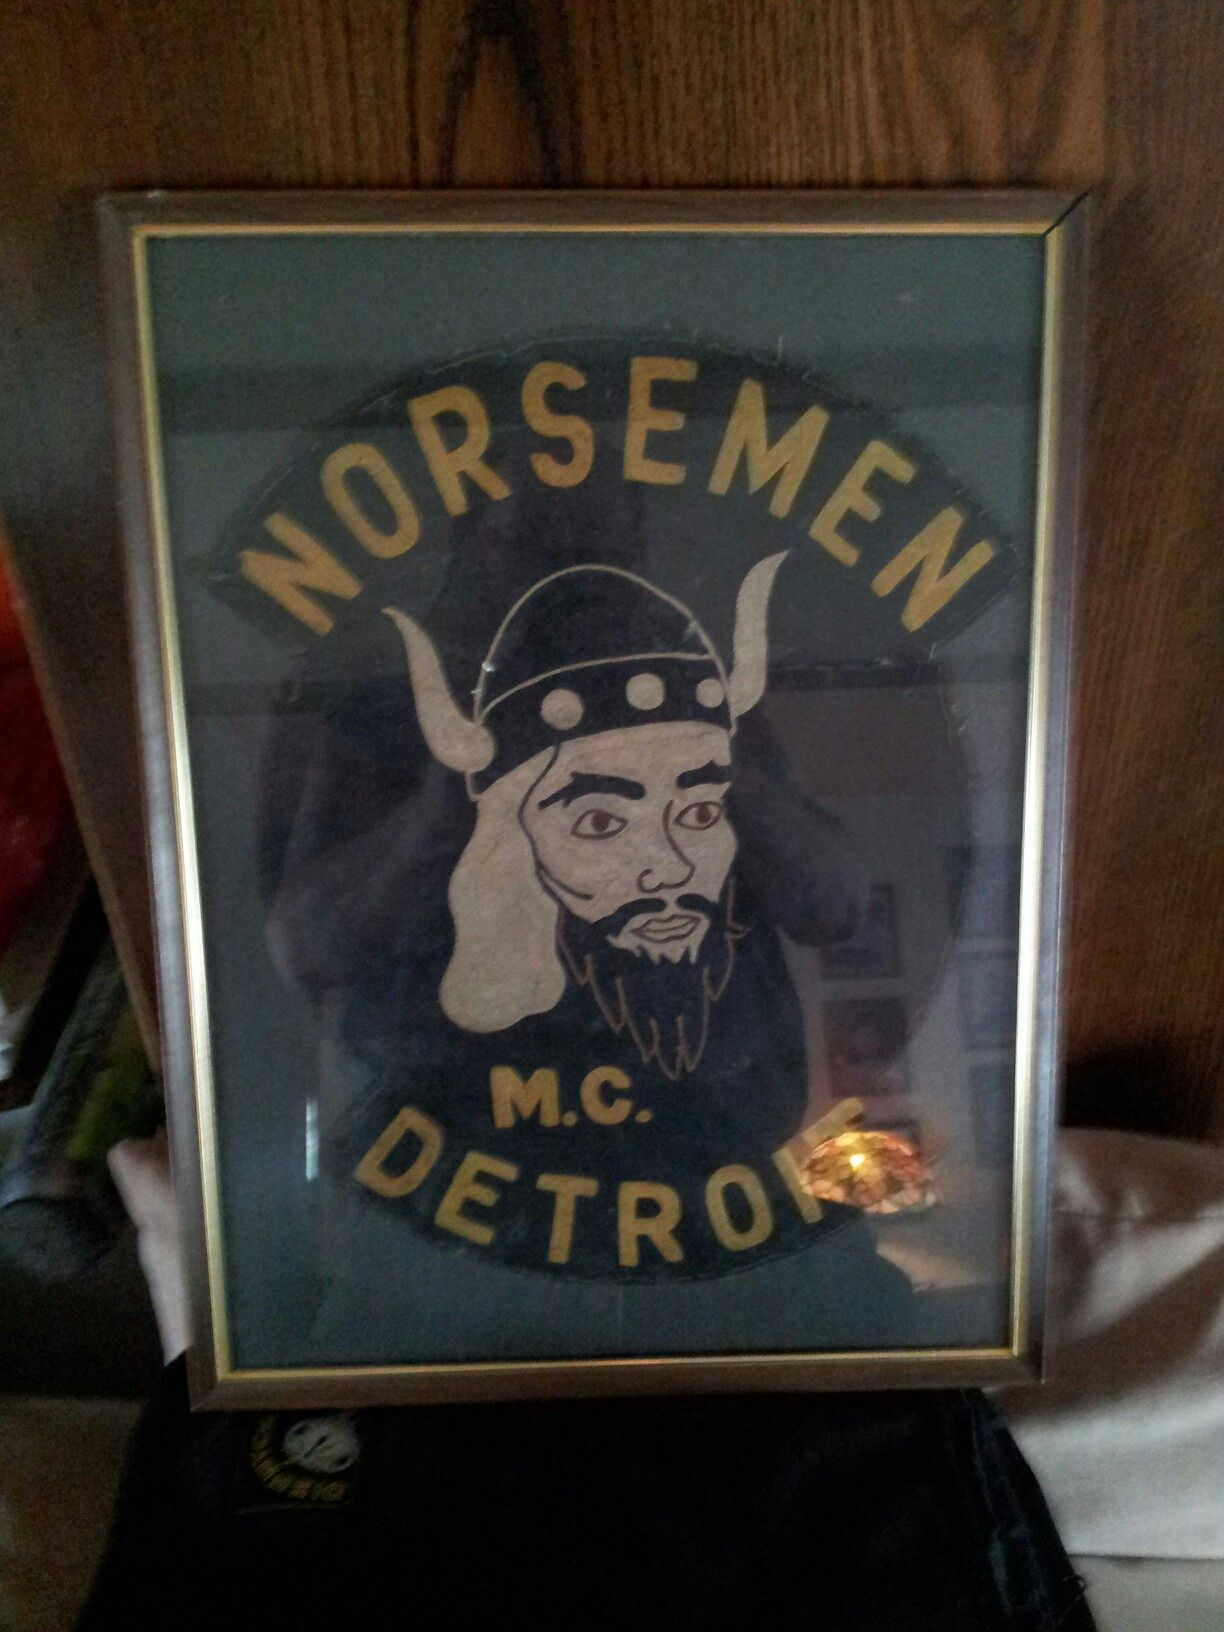 Norsemen MC Detroit merged with Violators MC Detroit in 1973  We